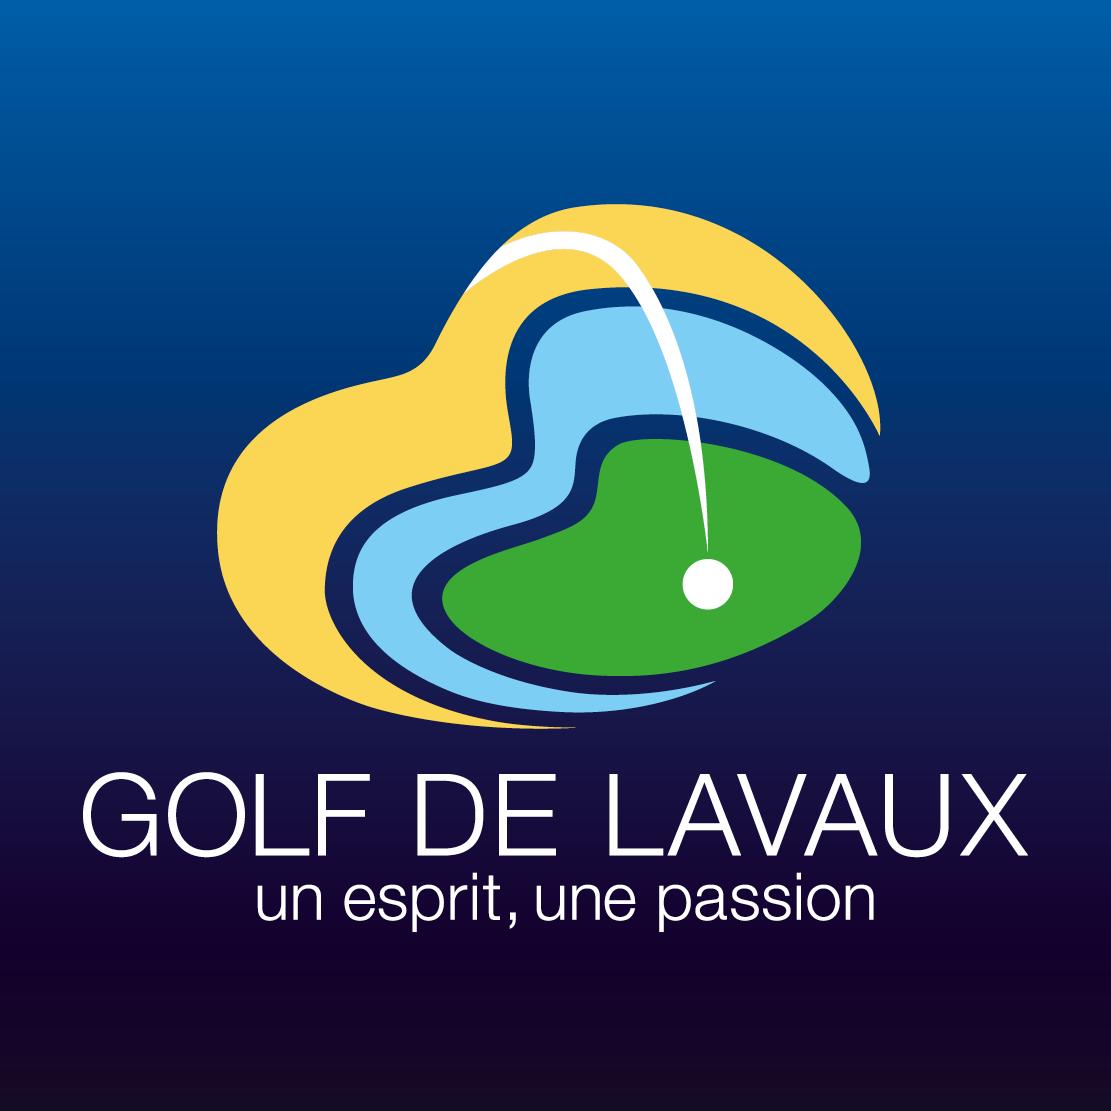 Logo of golf course named Golf de Lavaux